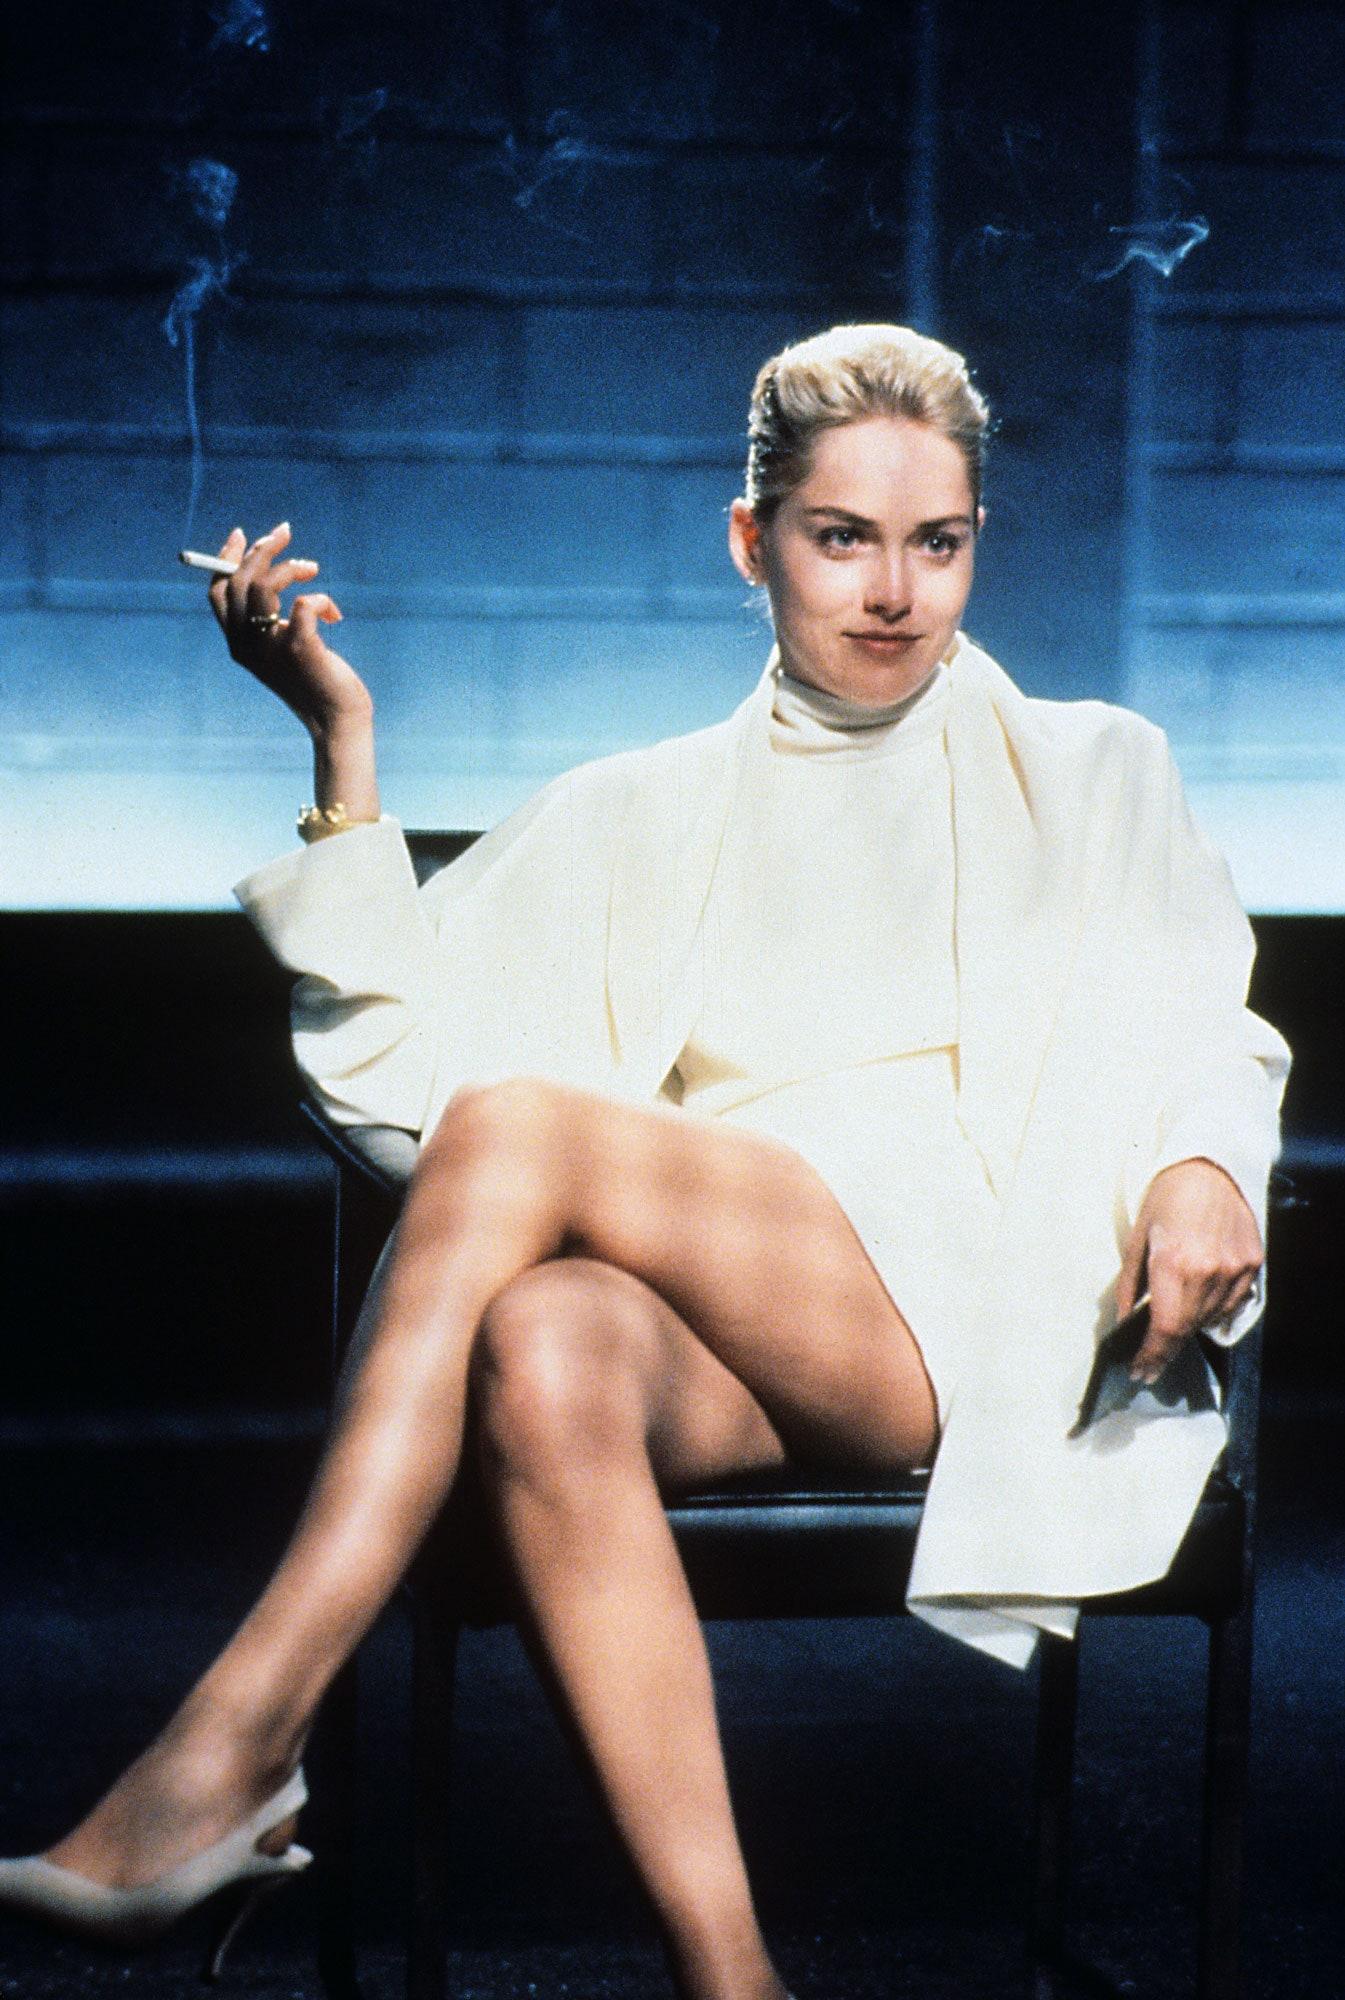 Sharon Stone in Basic Instinct.